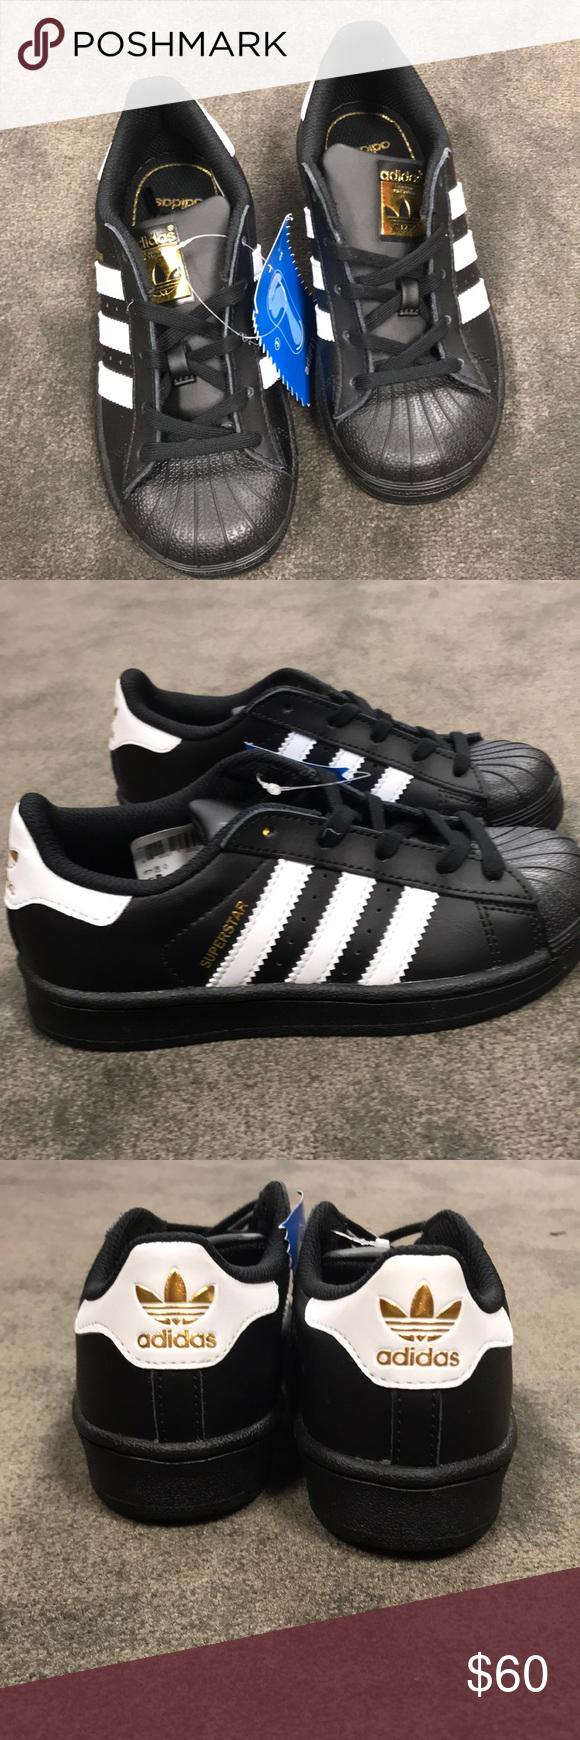 Toddler 12K Adidas unisex Boutique